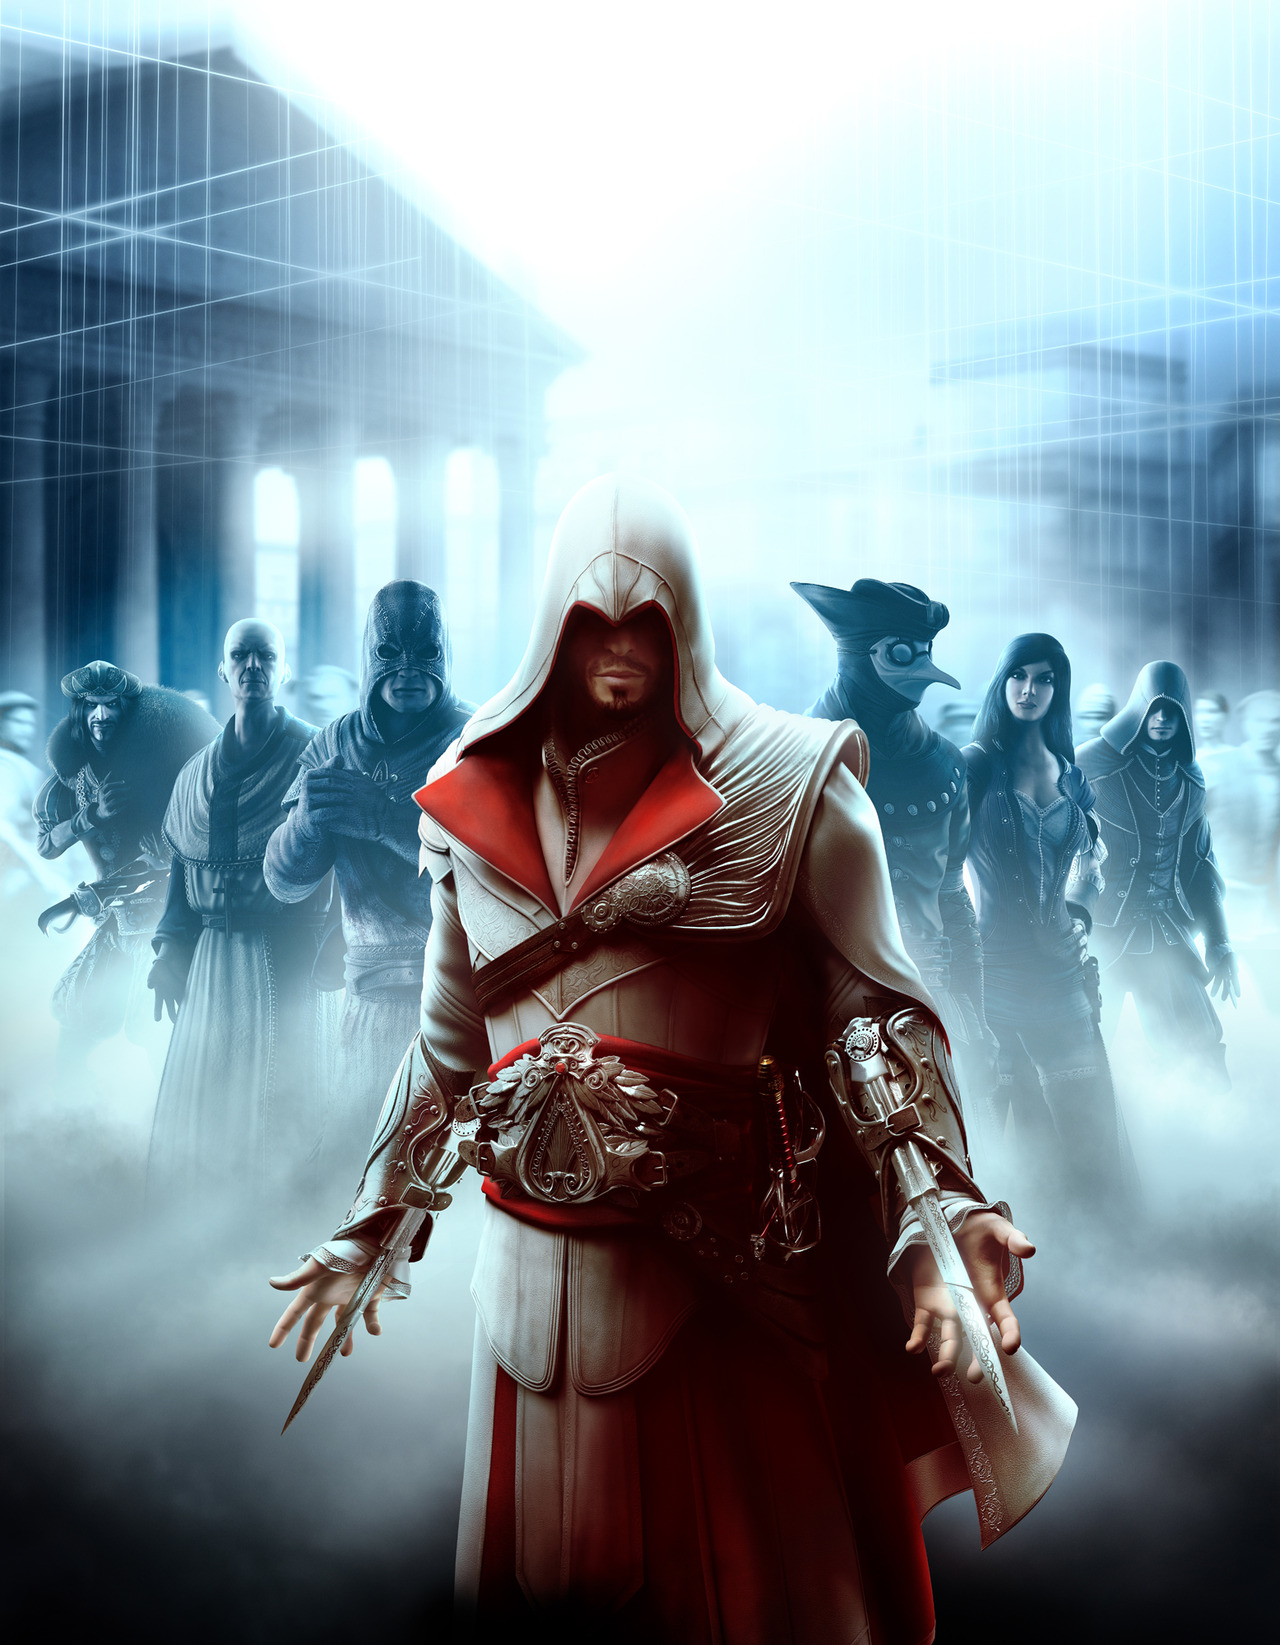 AssassinsCreedBrotherhood Visuel004